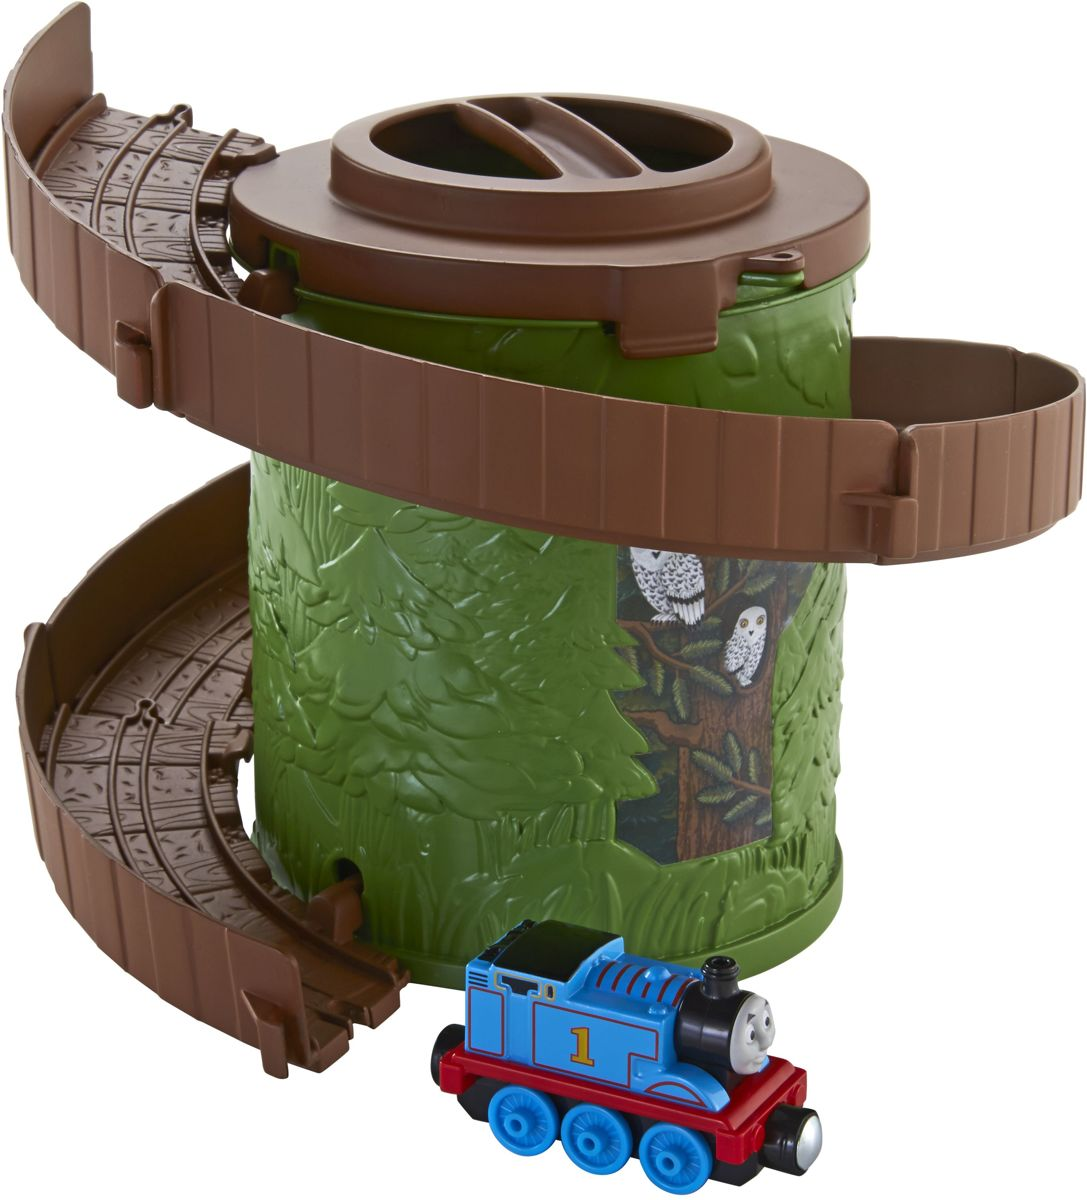 Speelset Thomas Spiral Tower groen